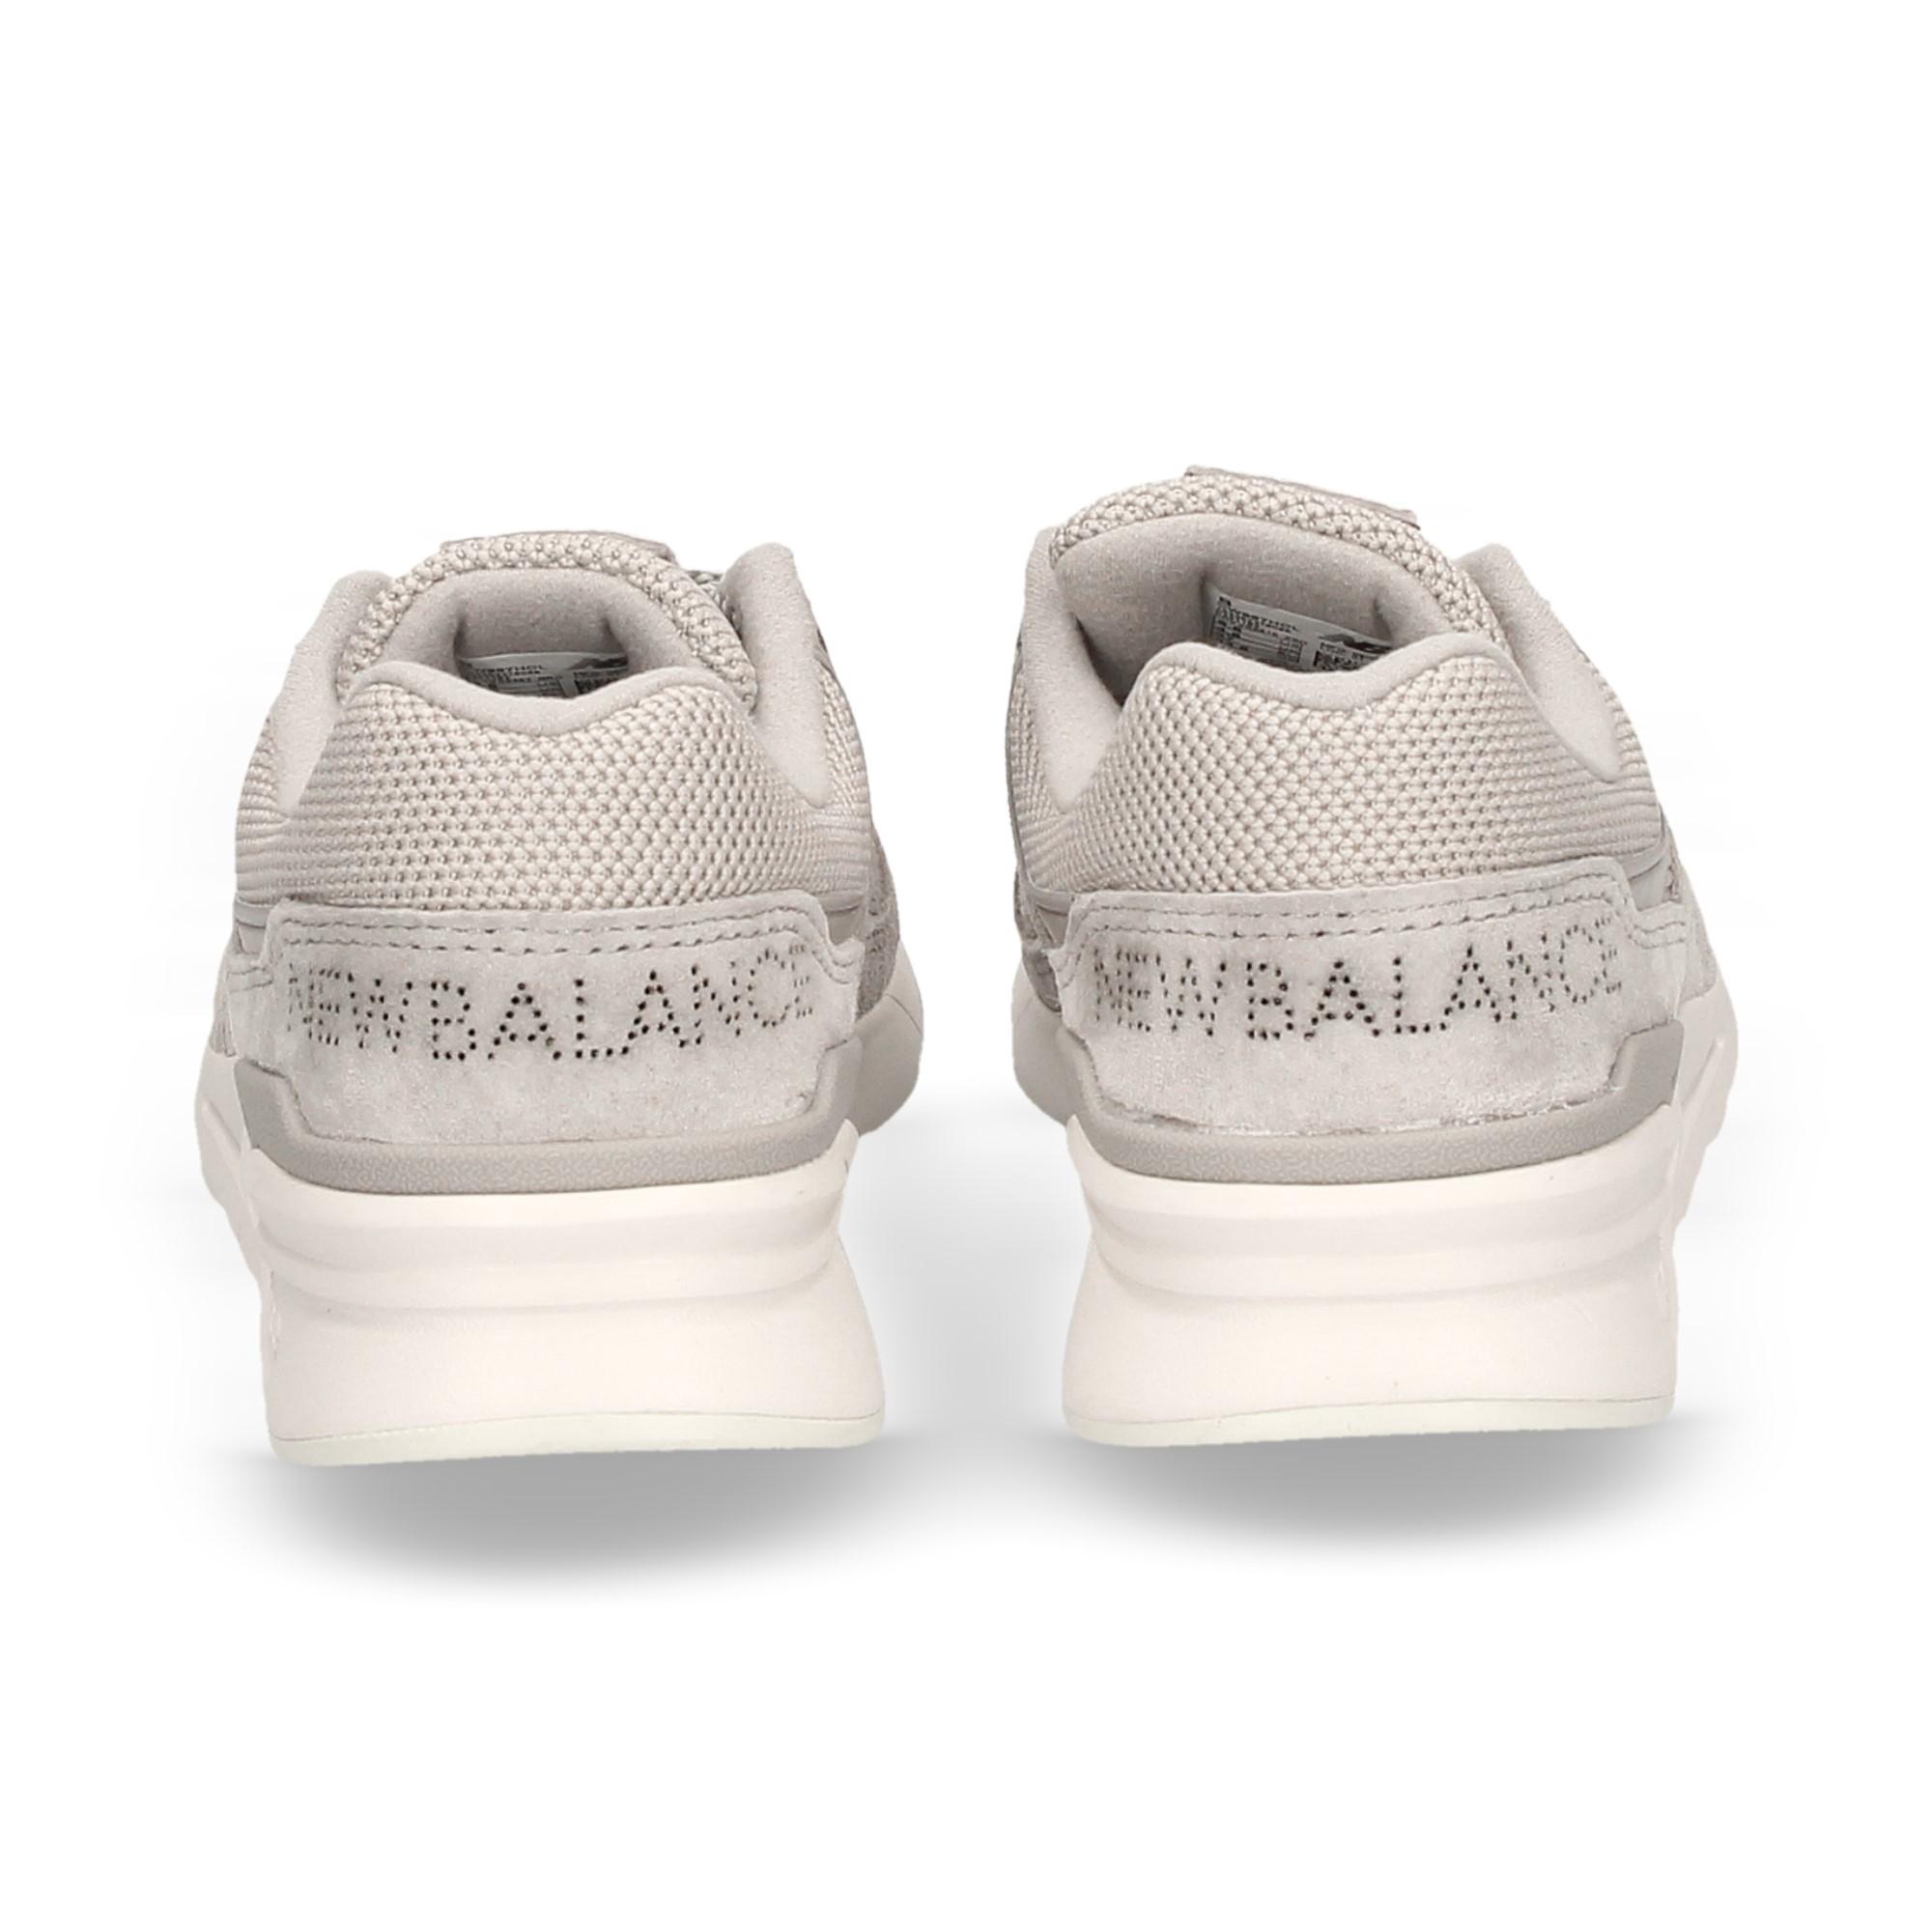 new balance 997 hck